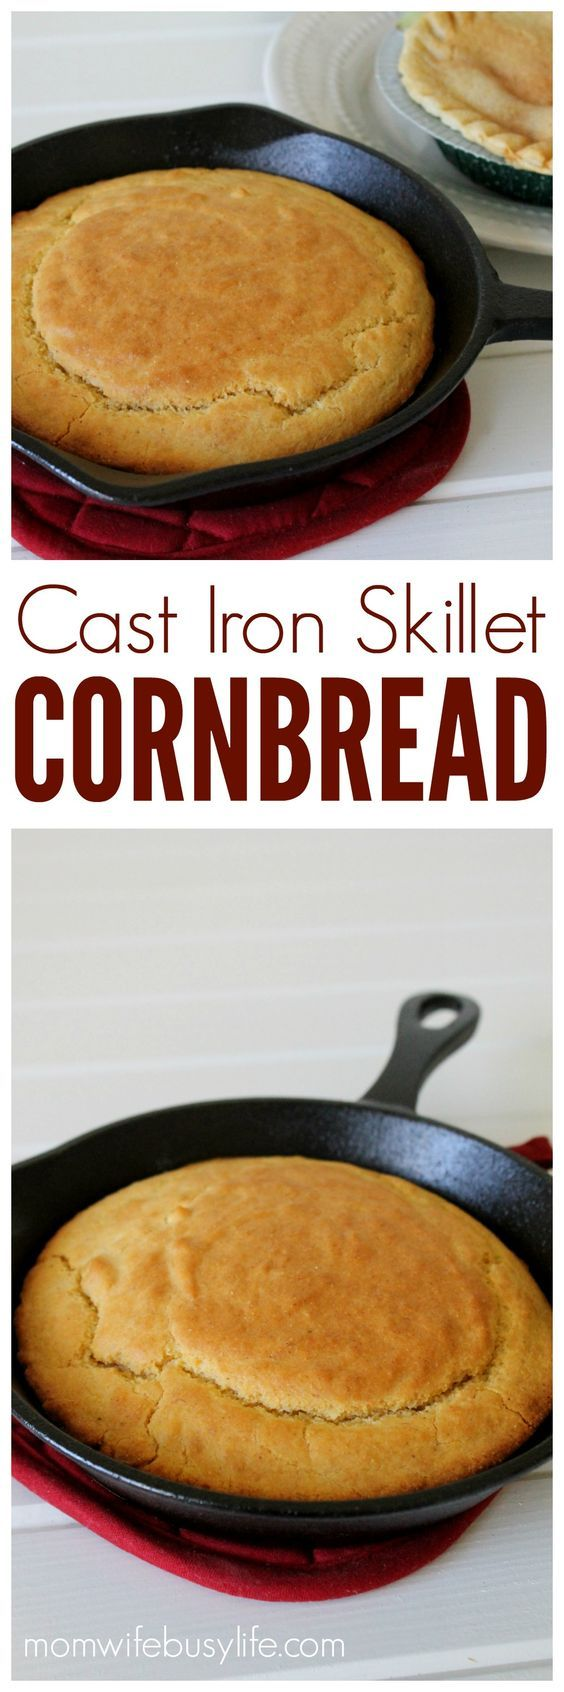 Cast Iron Skillet Cornbread Recipe Food Recipes Pinterest